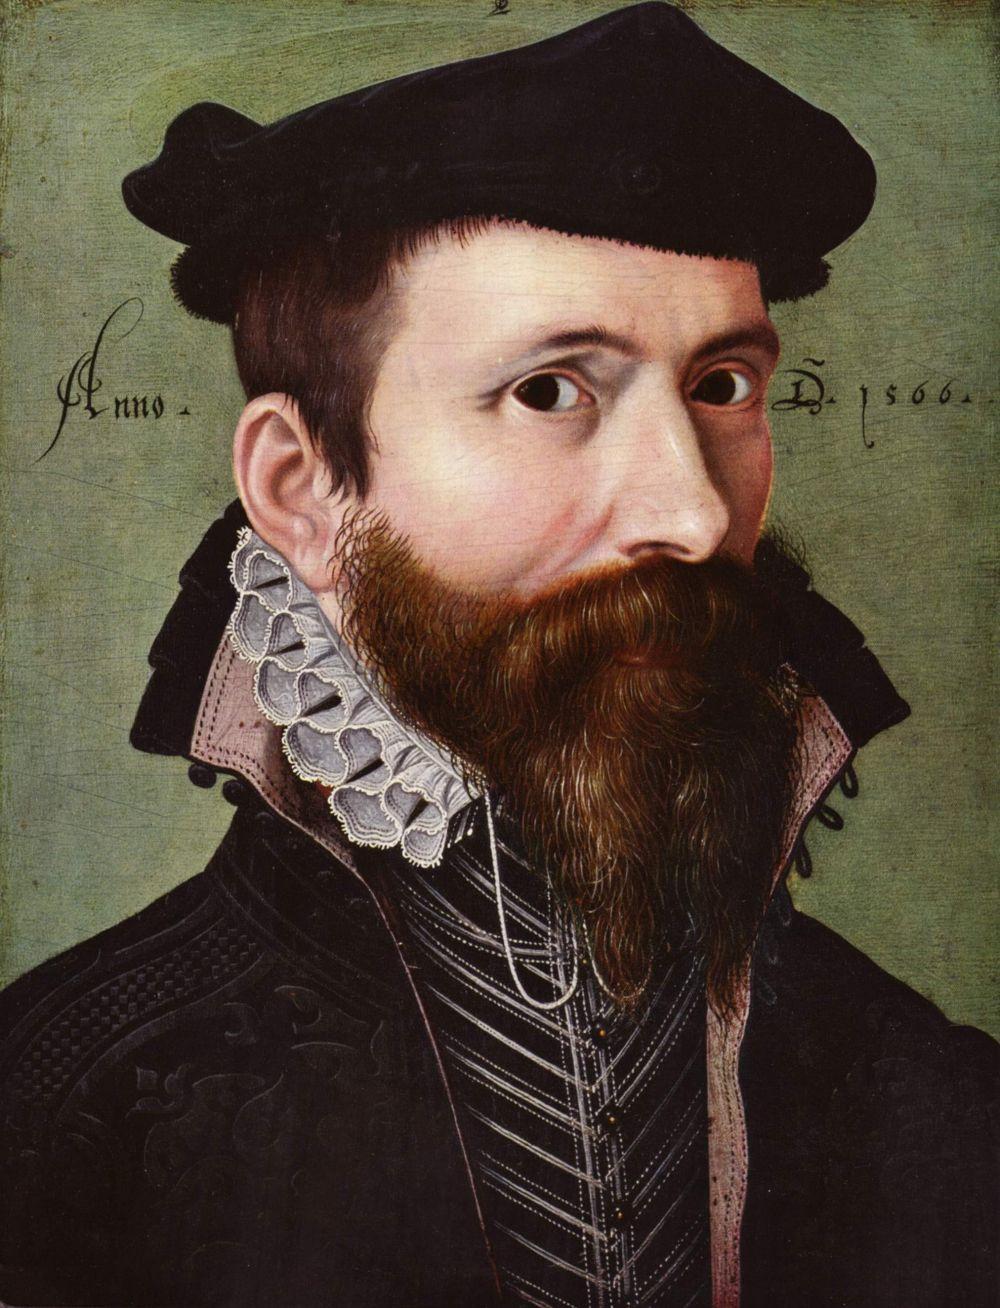 Ludger tom Ring Junior. Portrait of a man